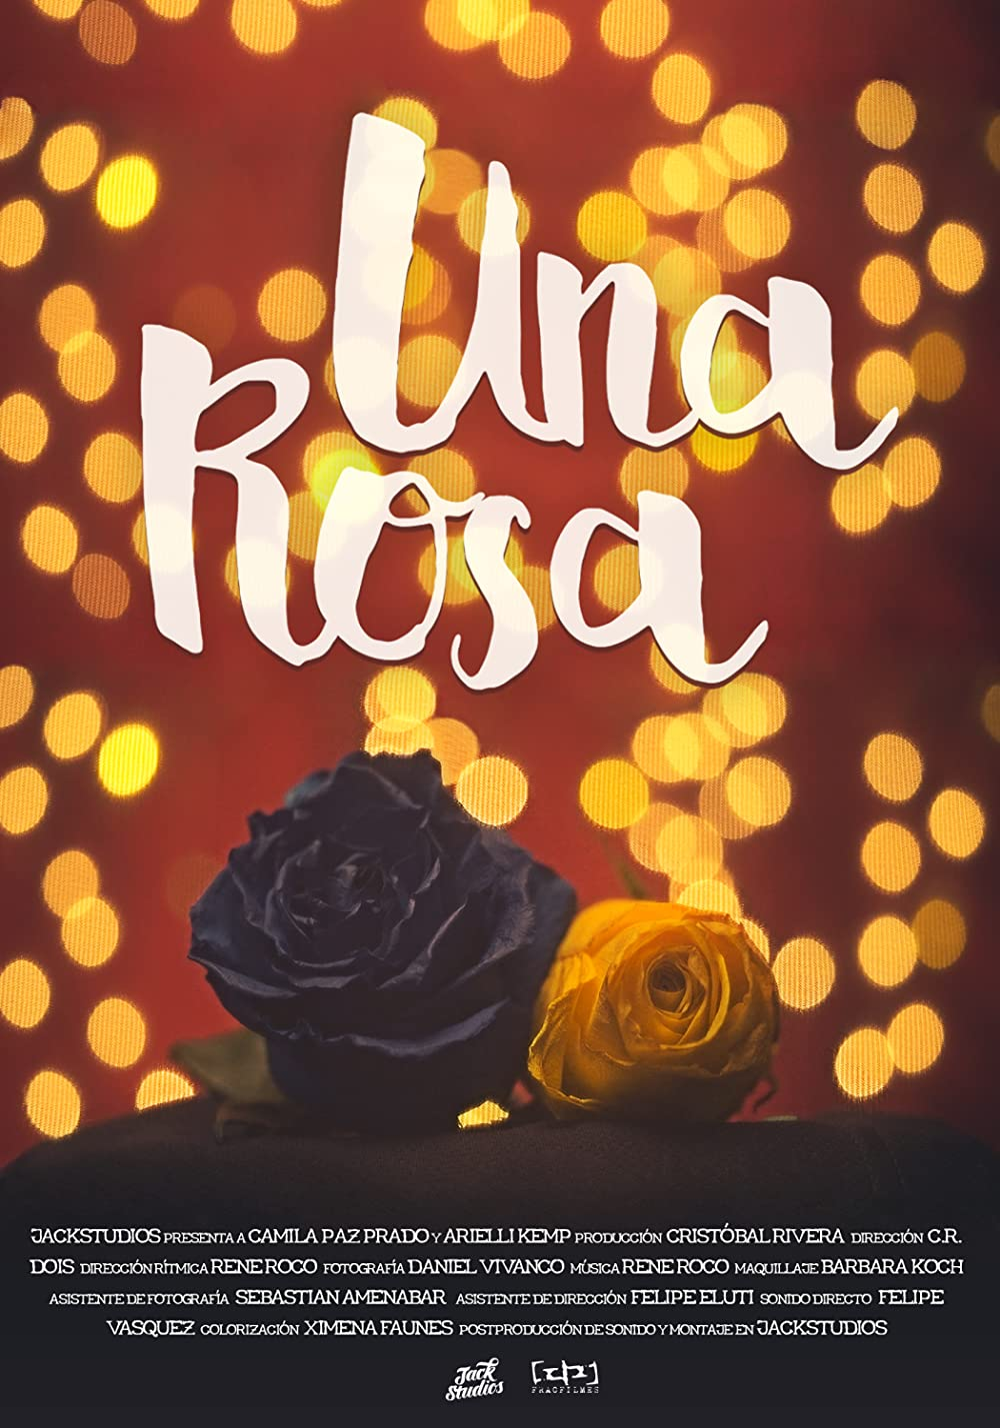 A Rose 2016